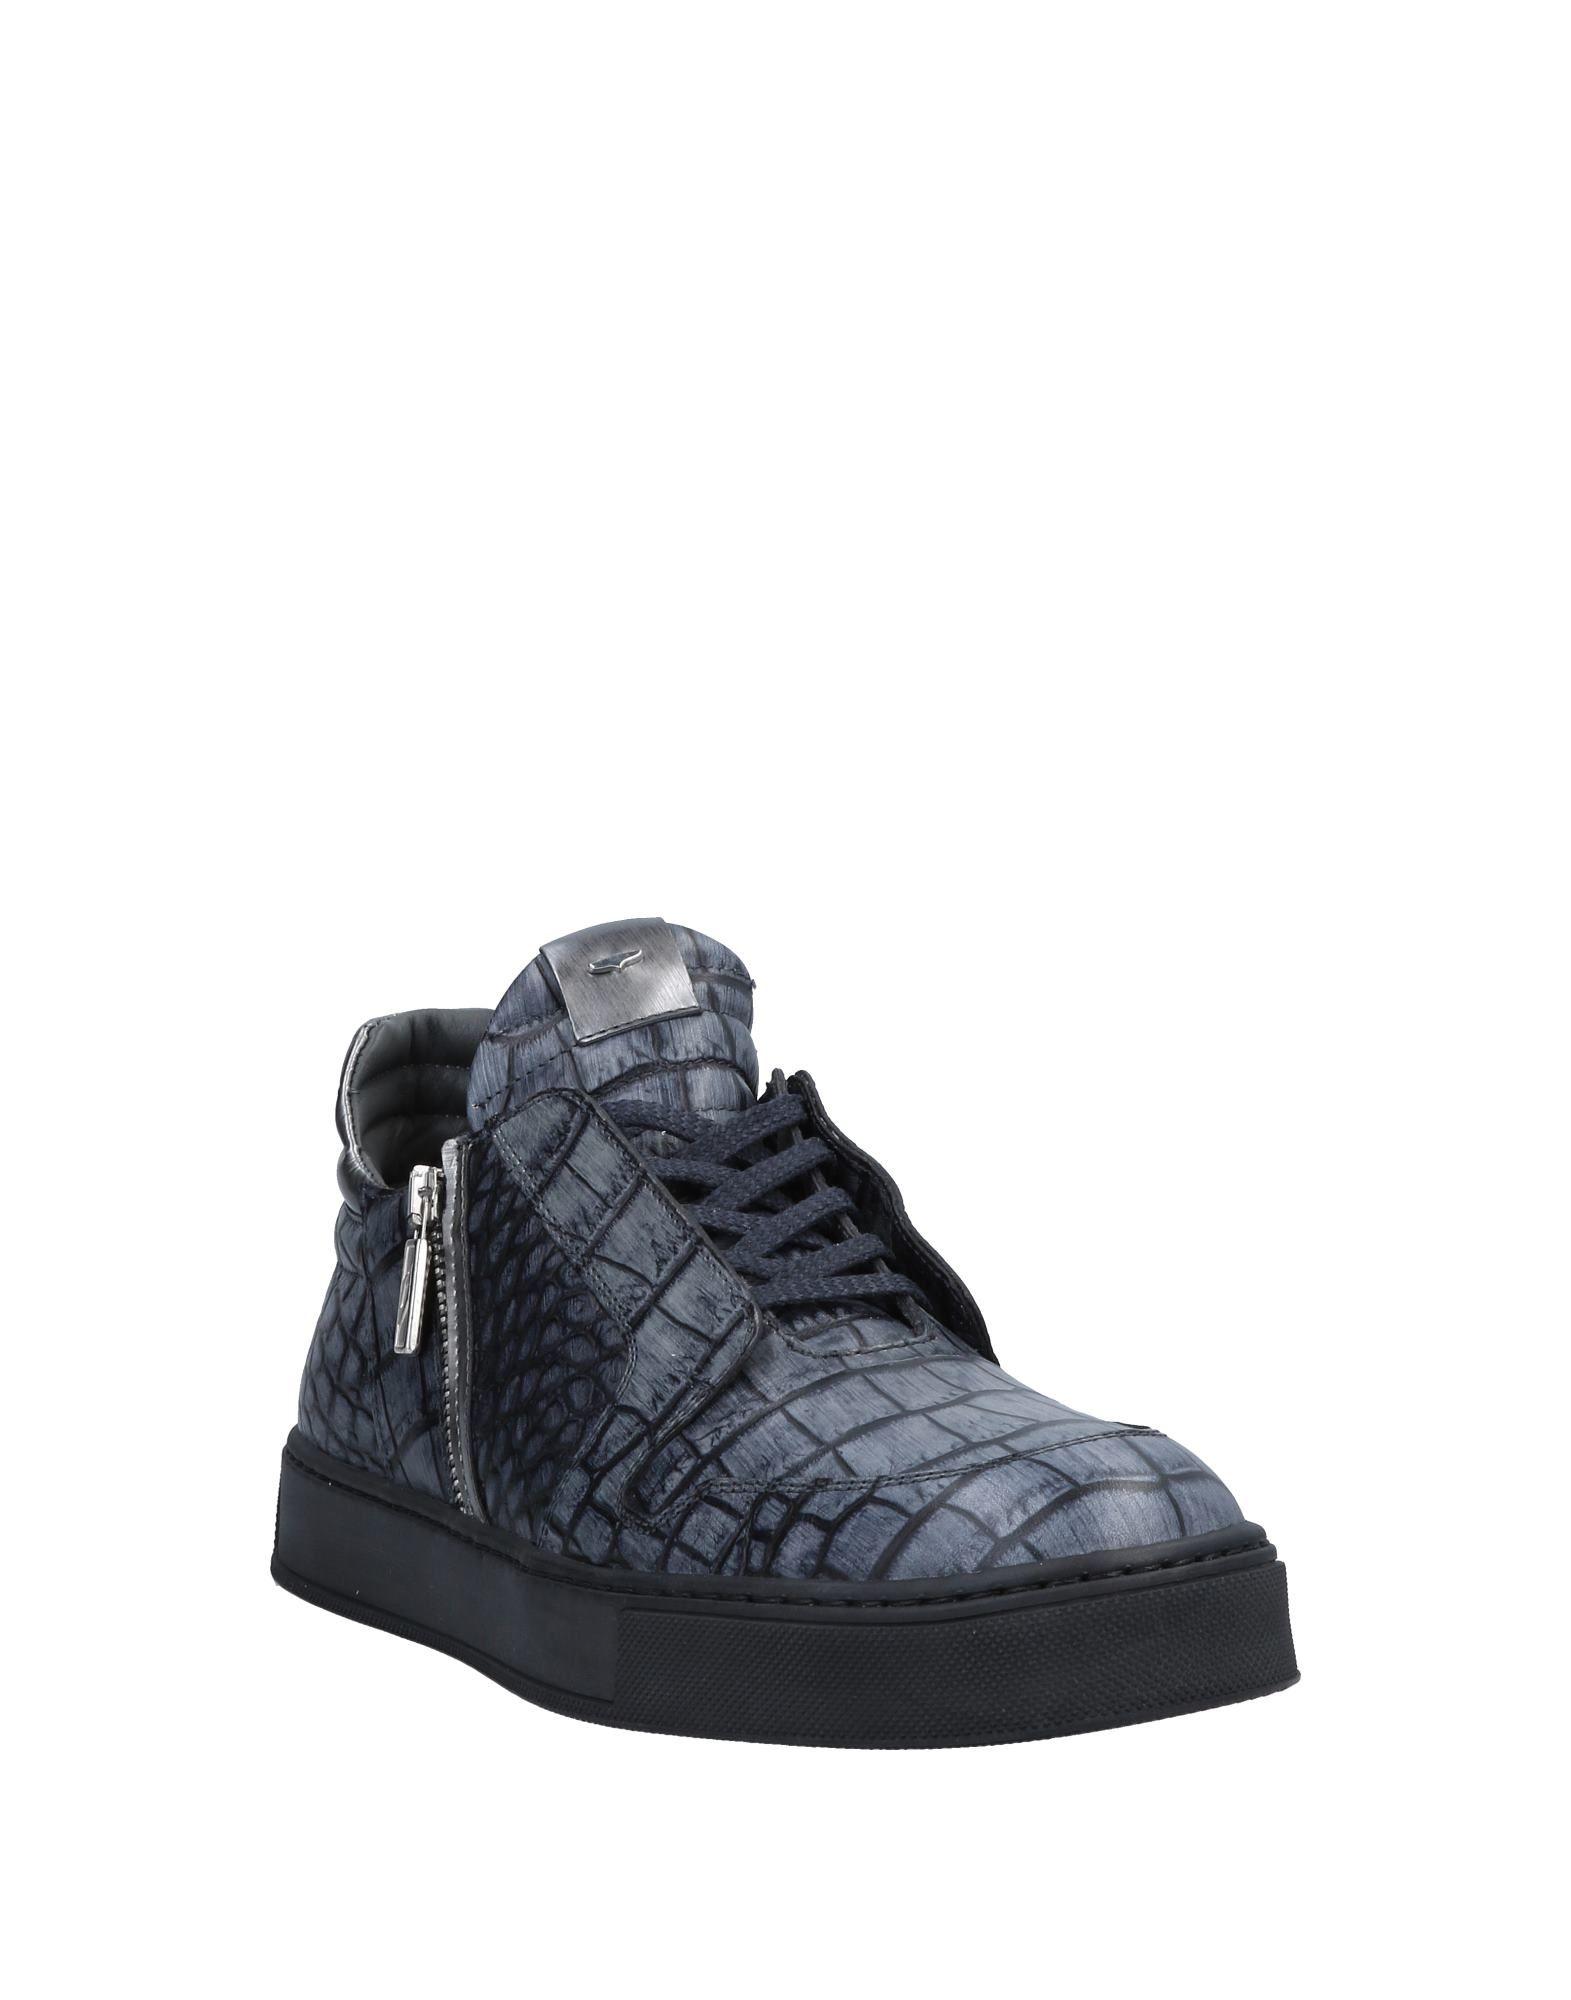 Alberto Alberto Alberto Guardiani Sneakers Herren Gutes Preis-Leistungs-Verhältnis, es lohnt sich 34cb4a